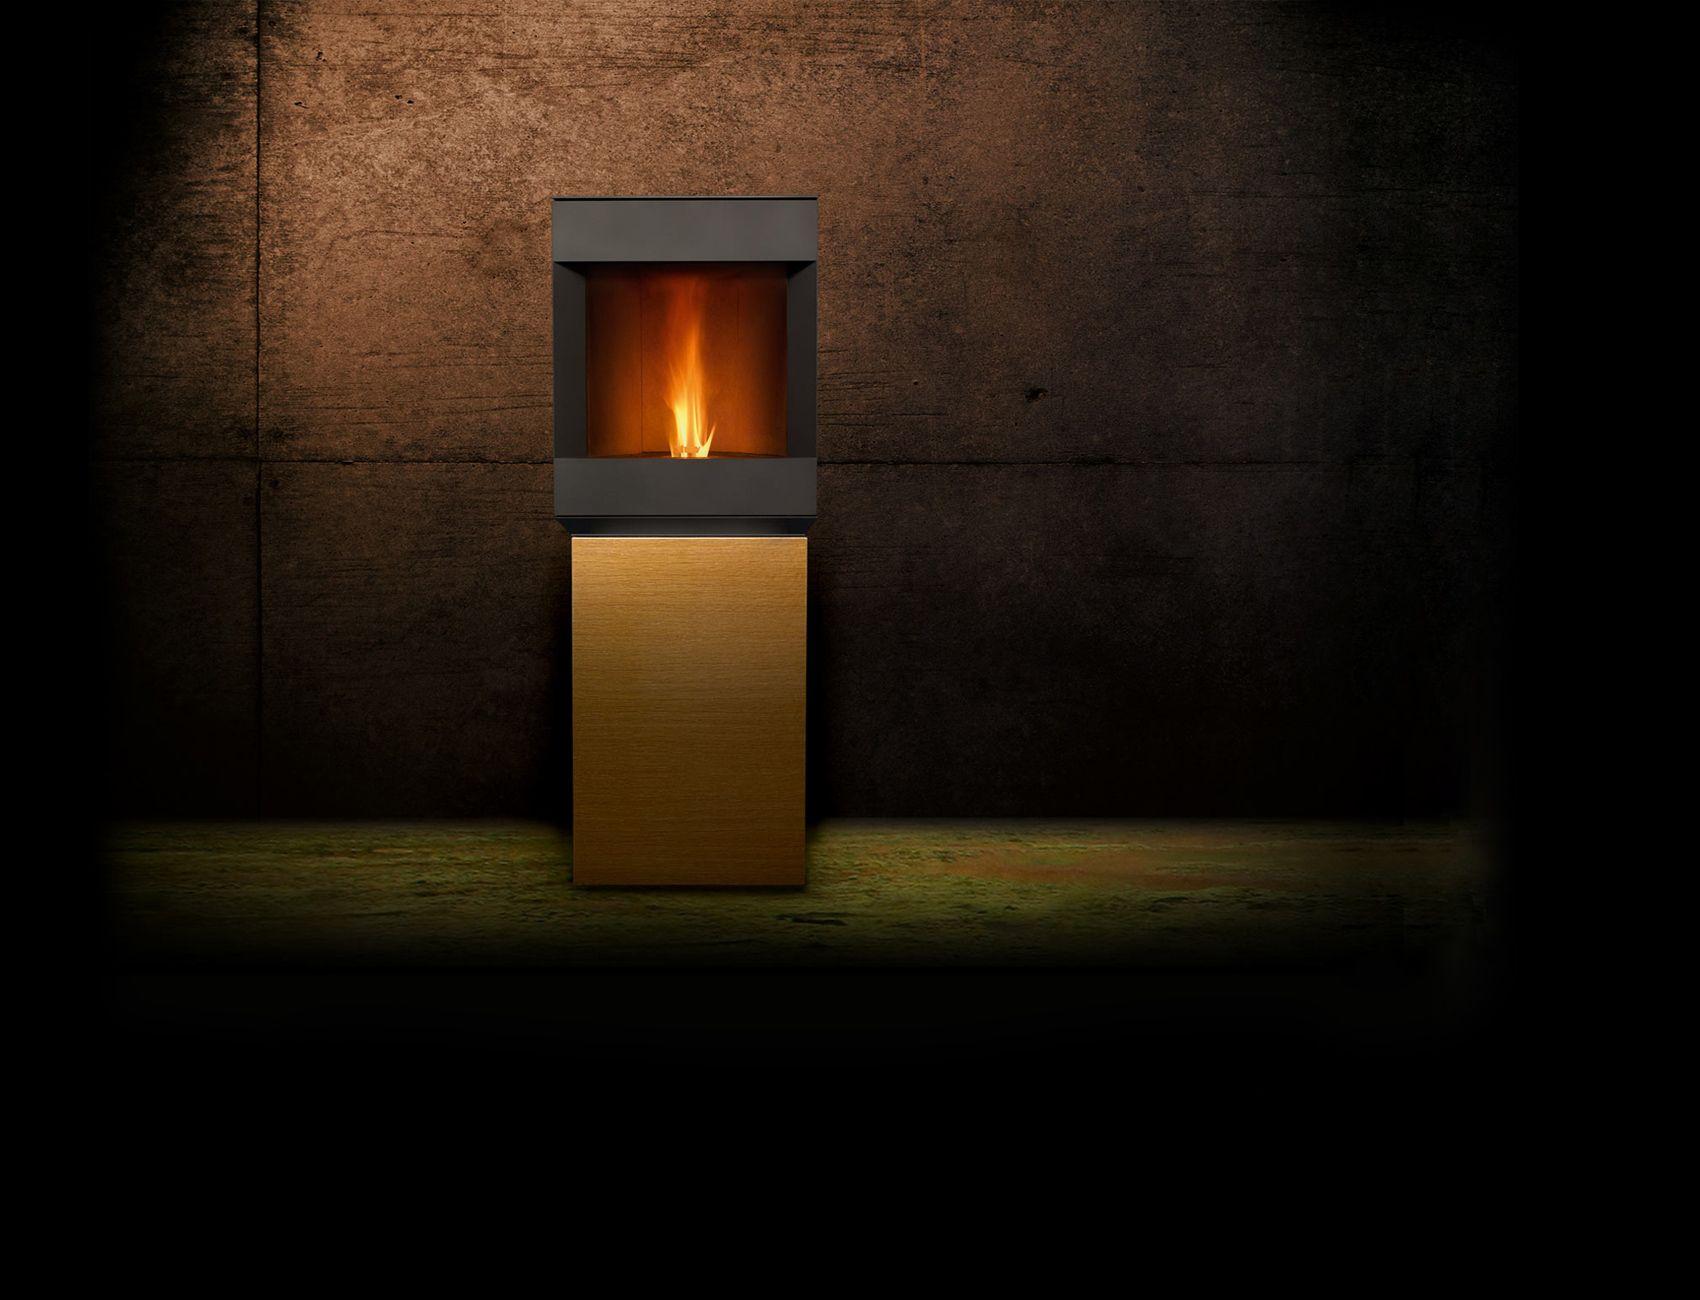 see full sized image. Black Bedroom Furniture Sets. Home Design Ideas